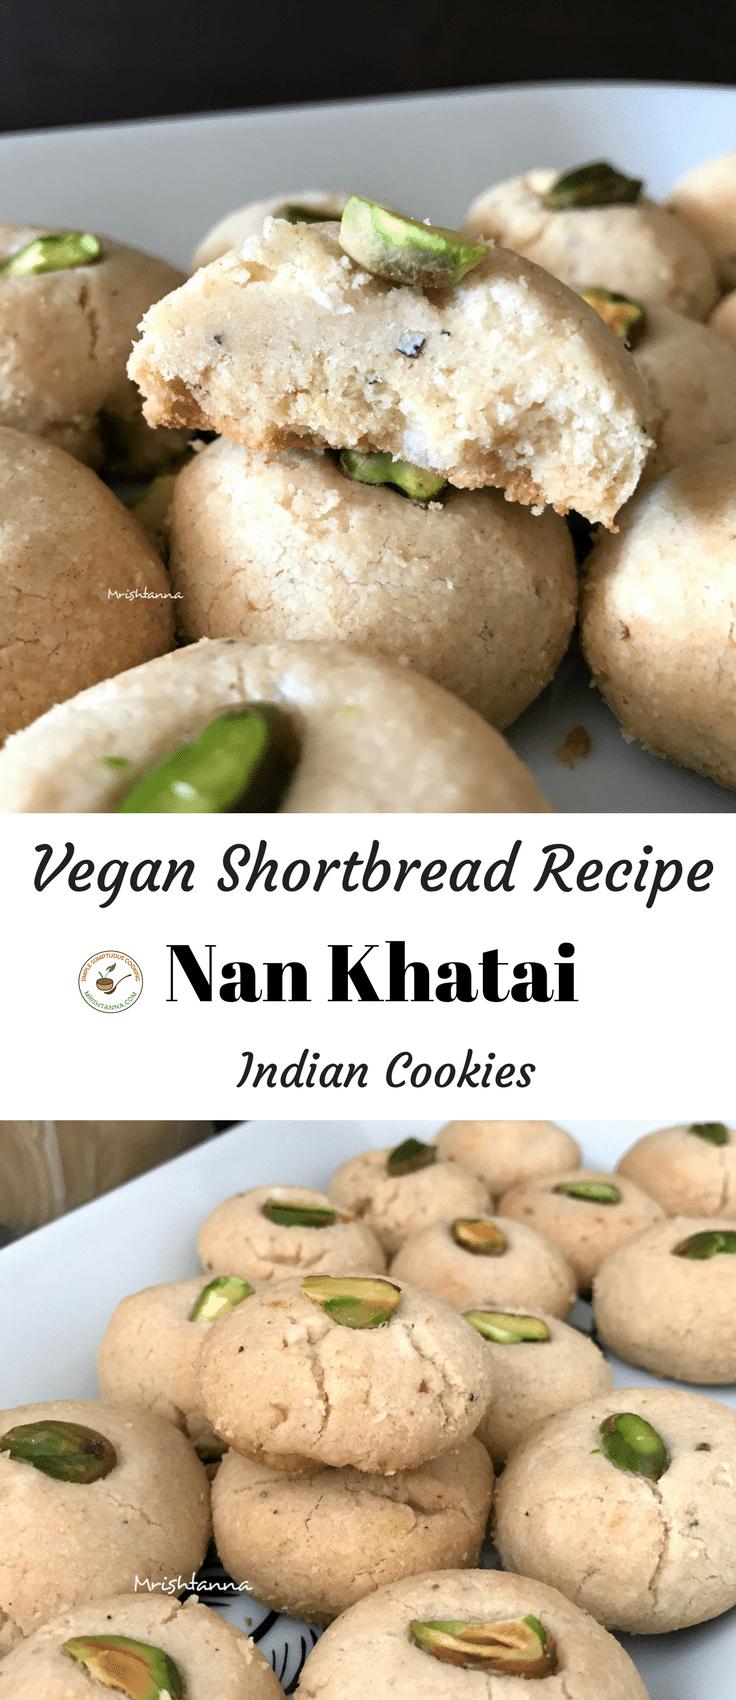 Vegan Shortbread (Nan Khatai) Recipe